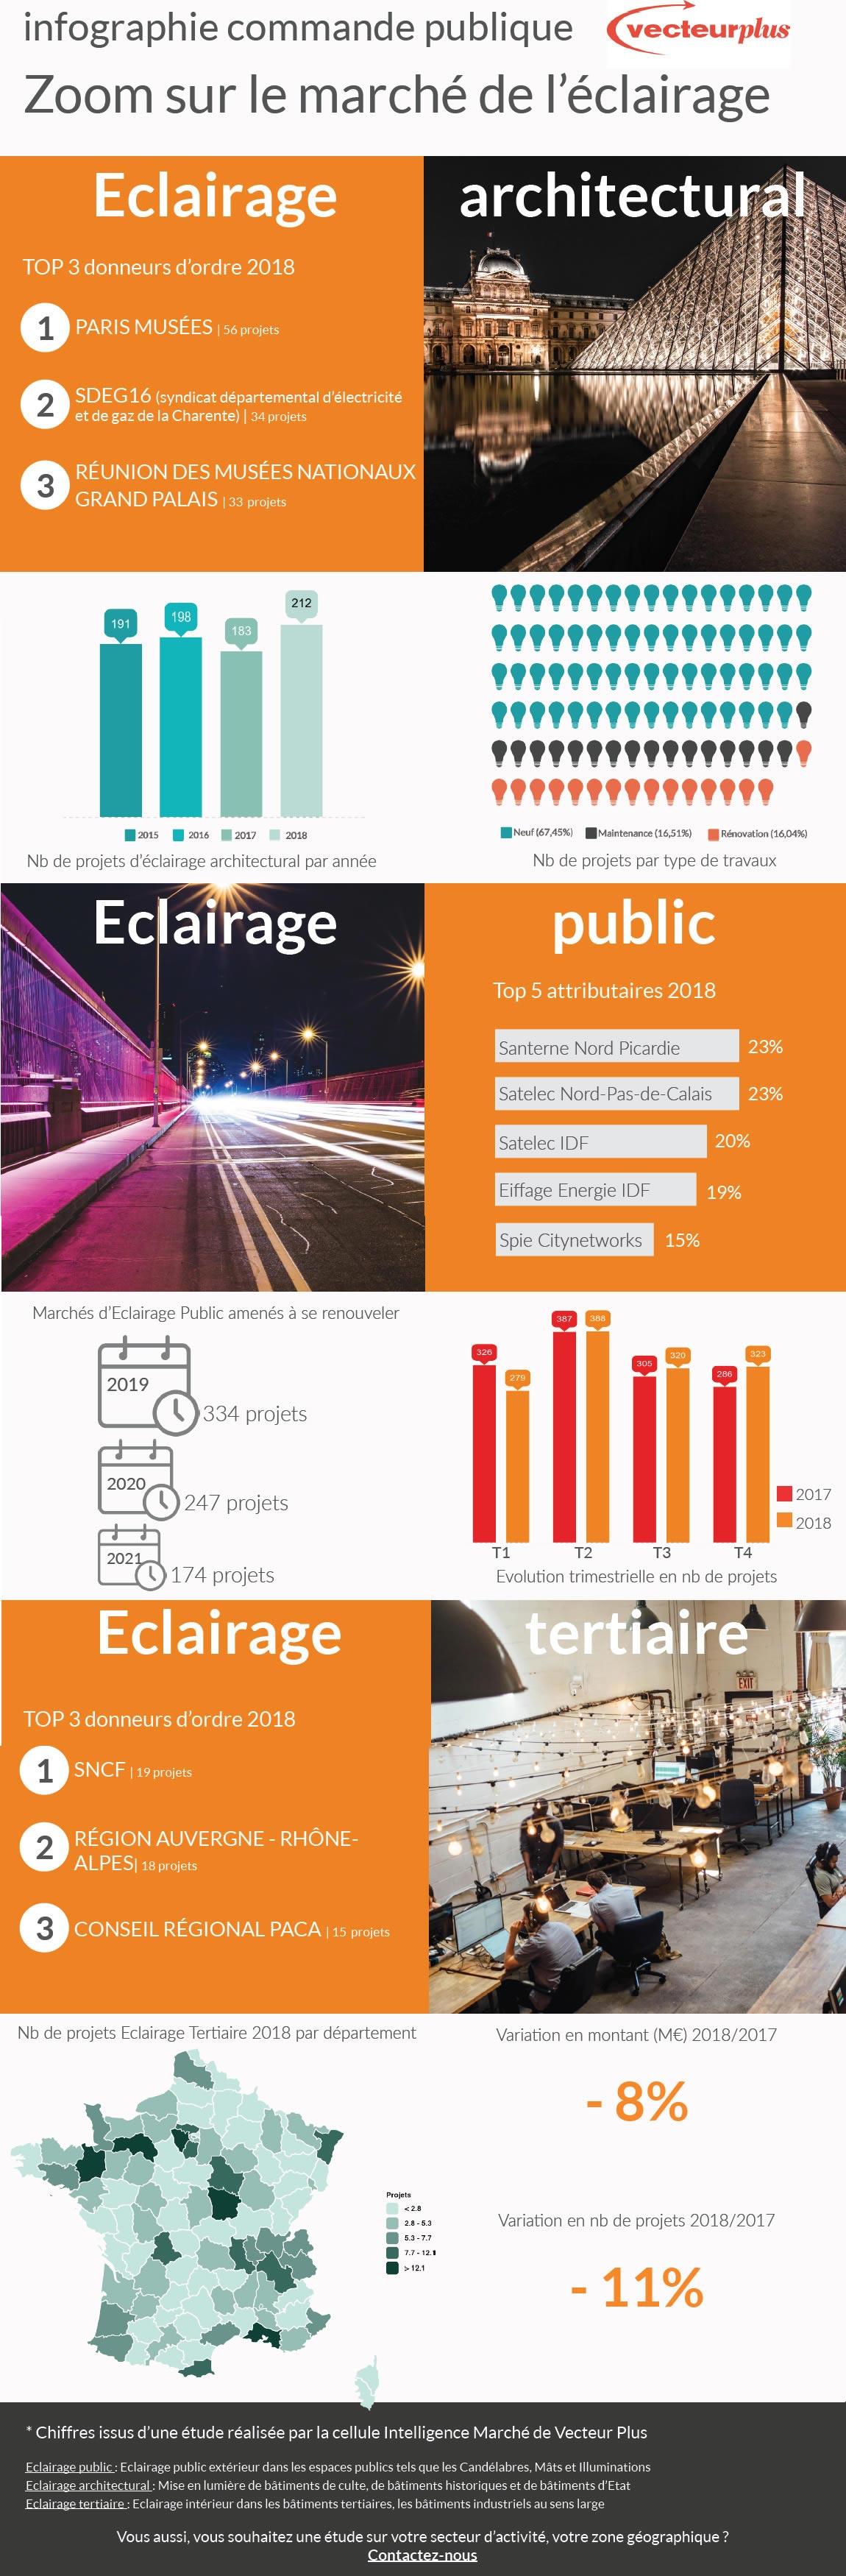 Infographie-Eclairage-2018-1